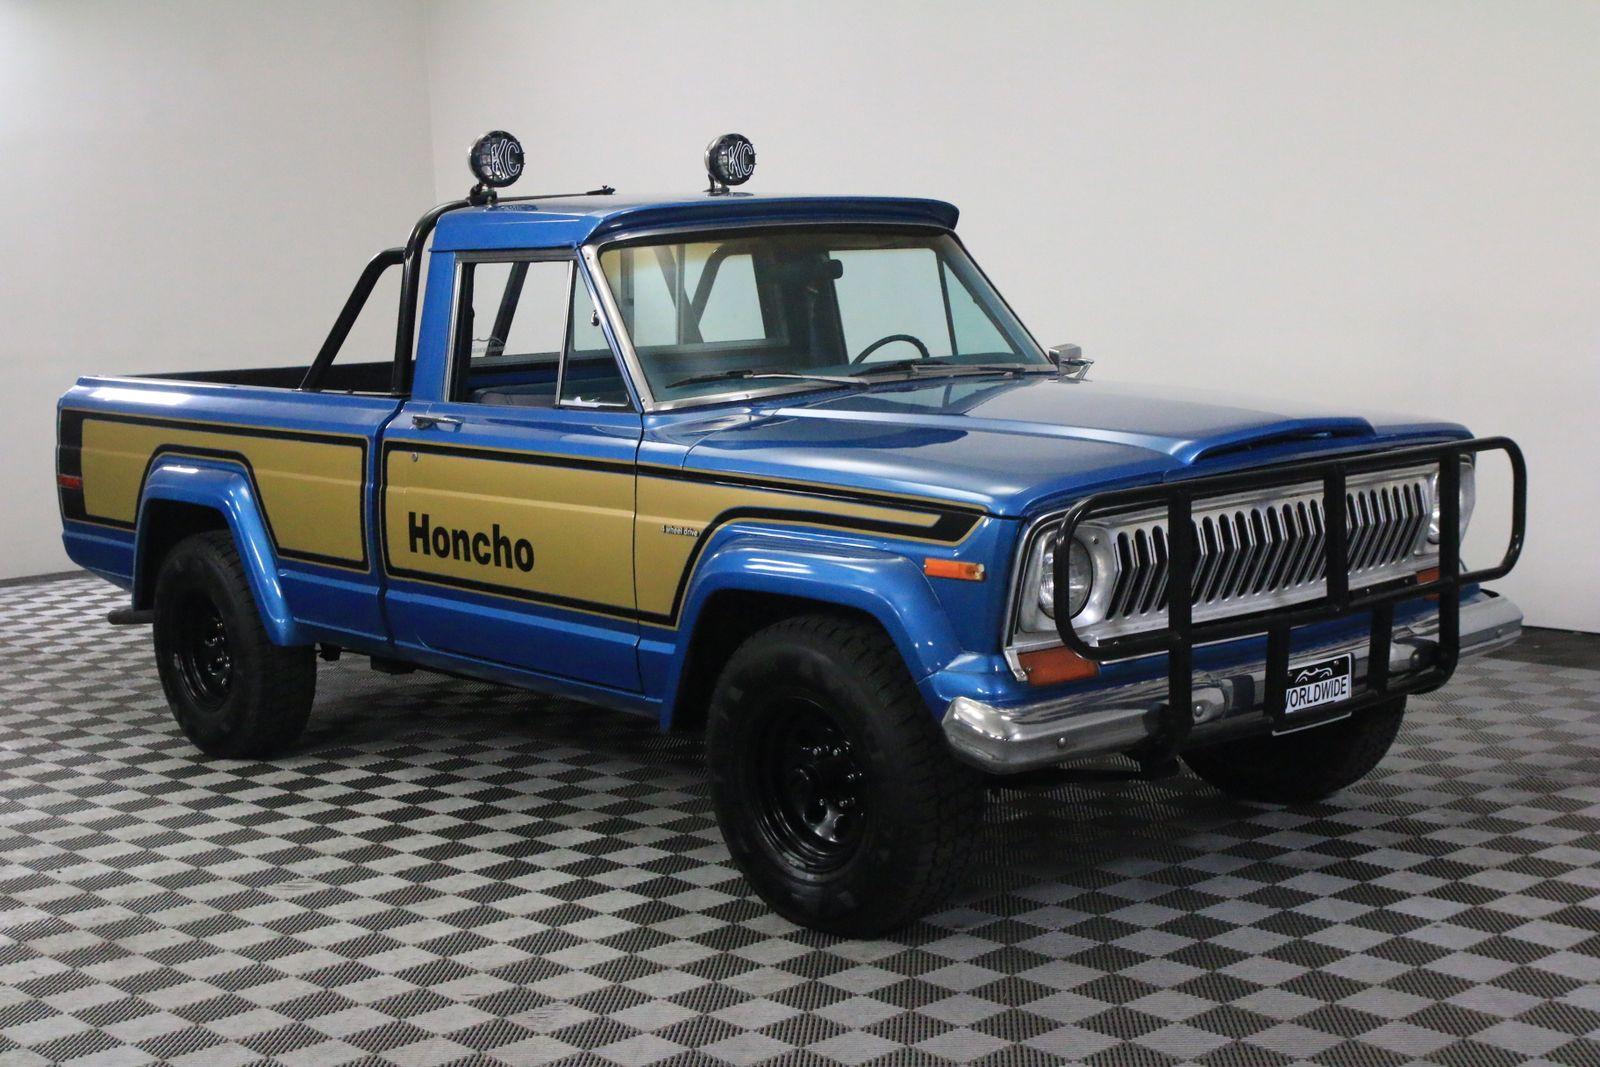 1978 Blue Honcho Gladiator Restored Rare Used Jeep J10